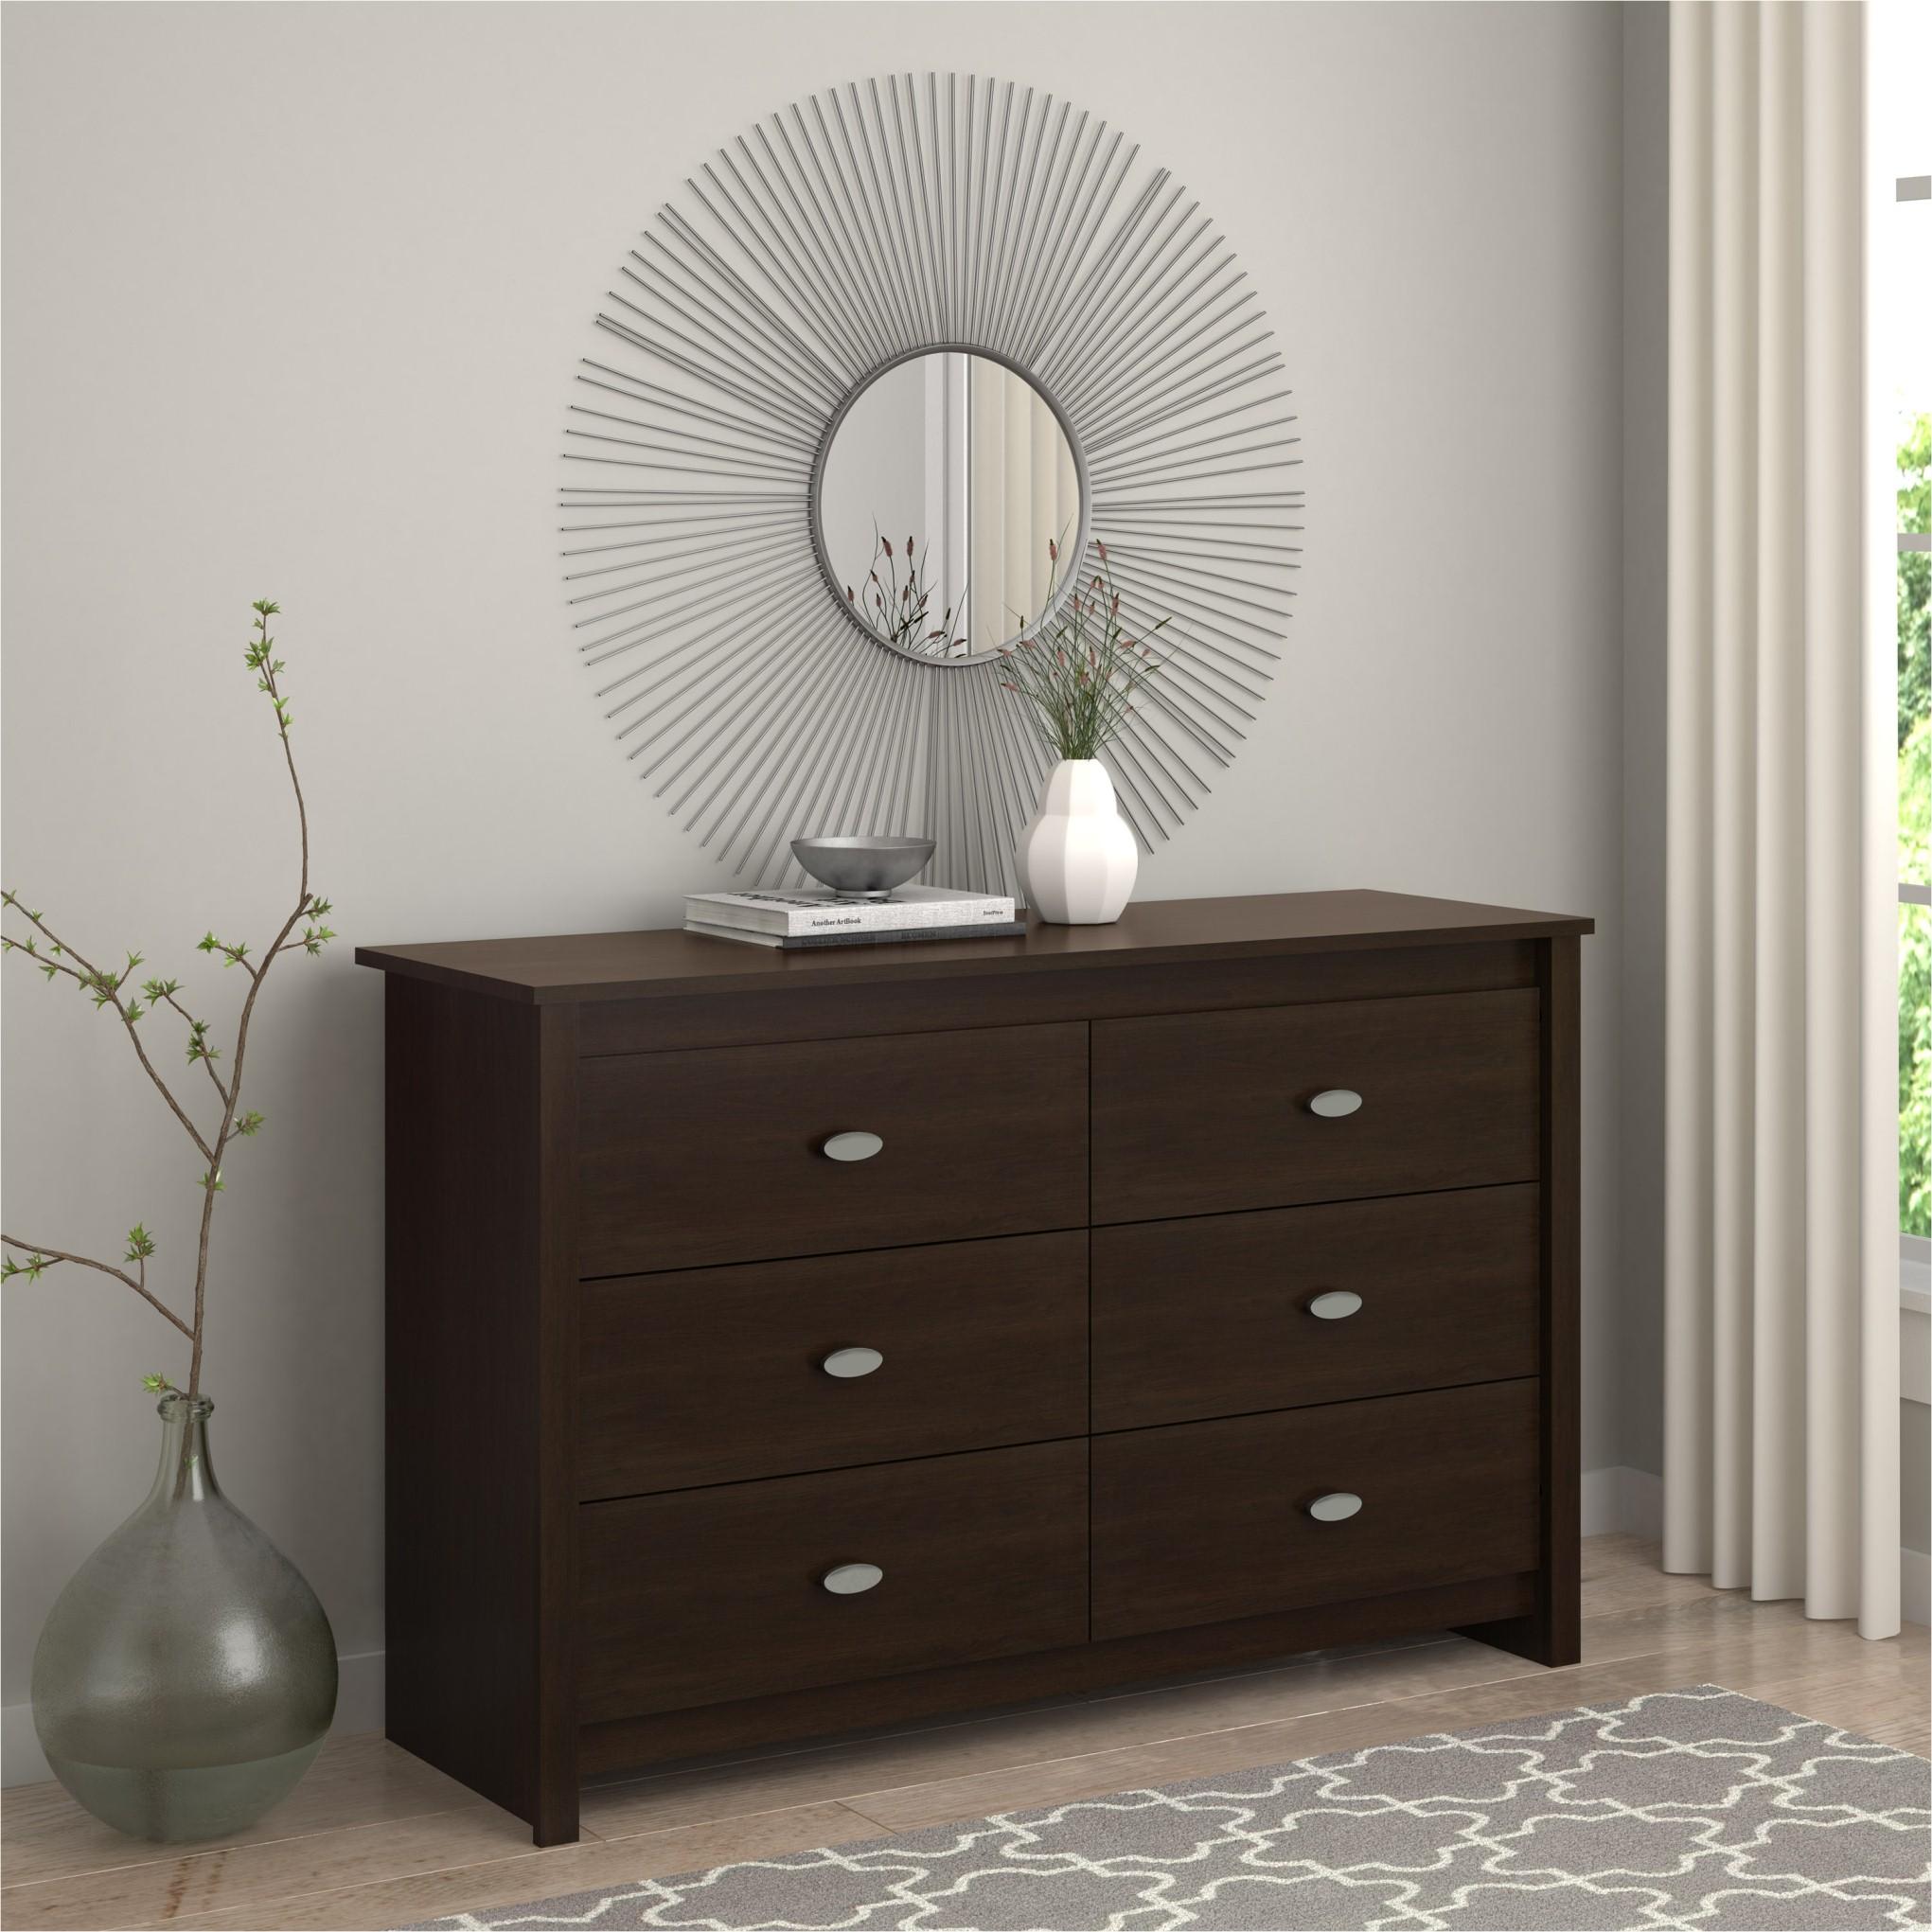 Ameriwood Bedroom Furniture  Kmartcom